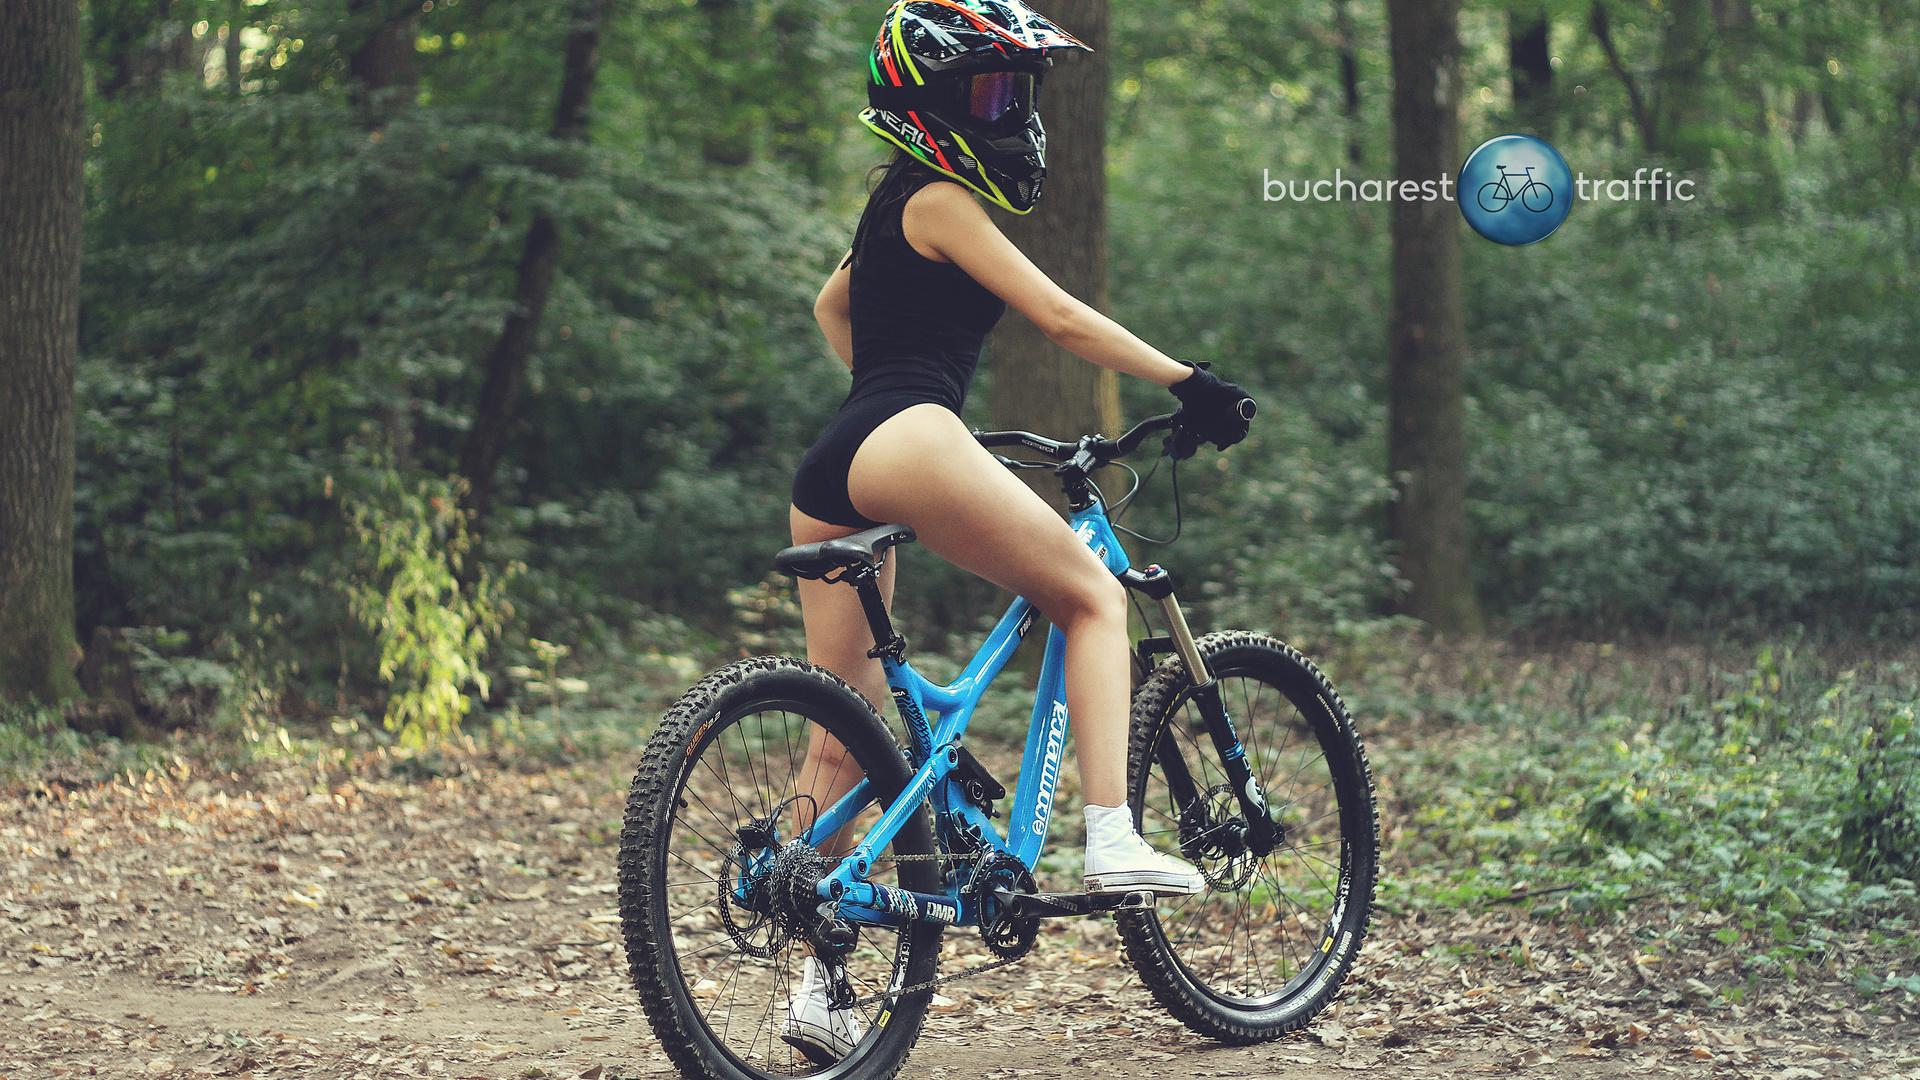 bucharestbiketraffic, лес, велосипед, шлем, спорт, девушка, в лесу, следуй за мной